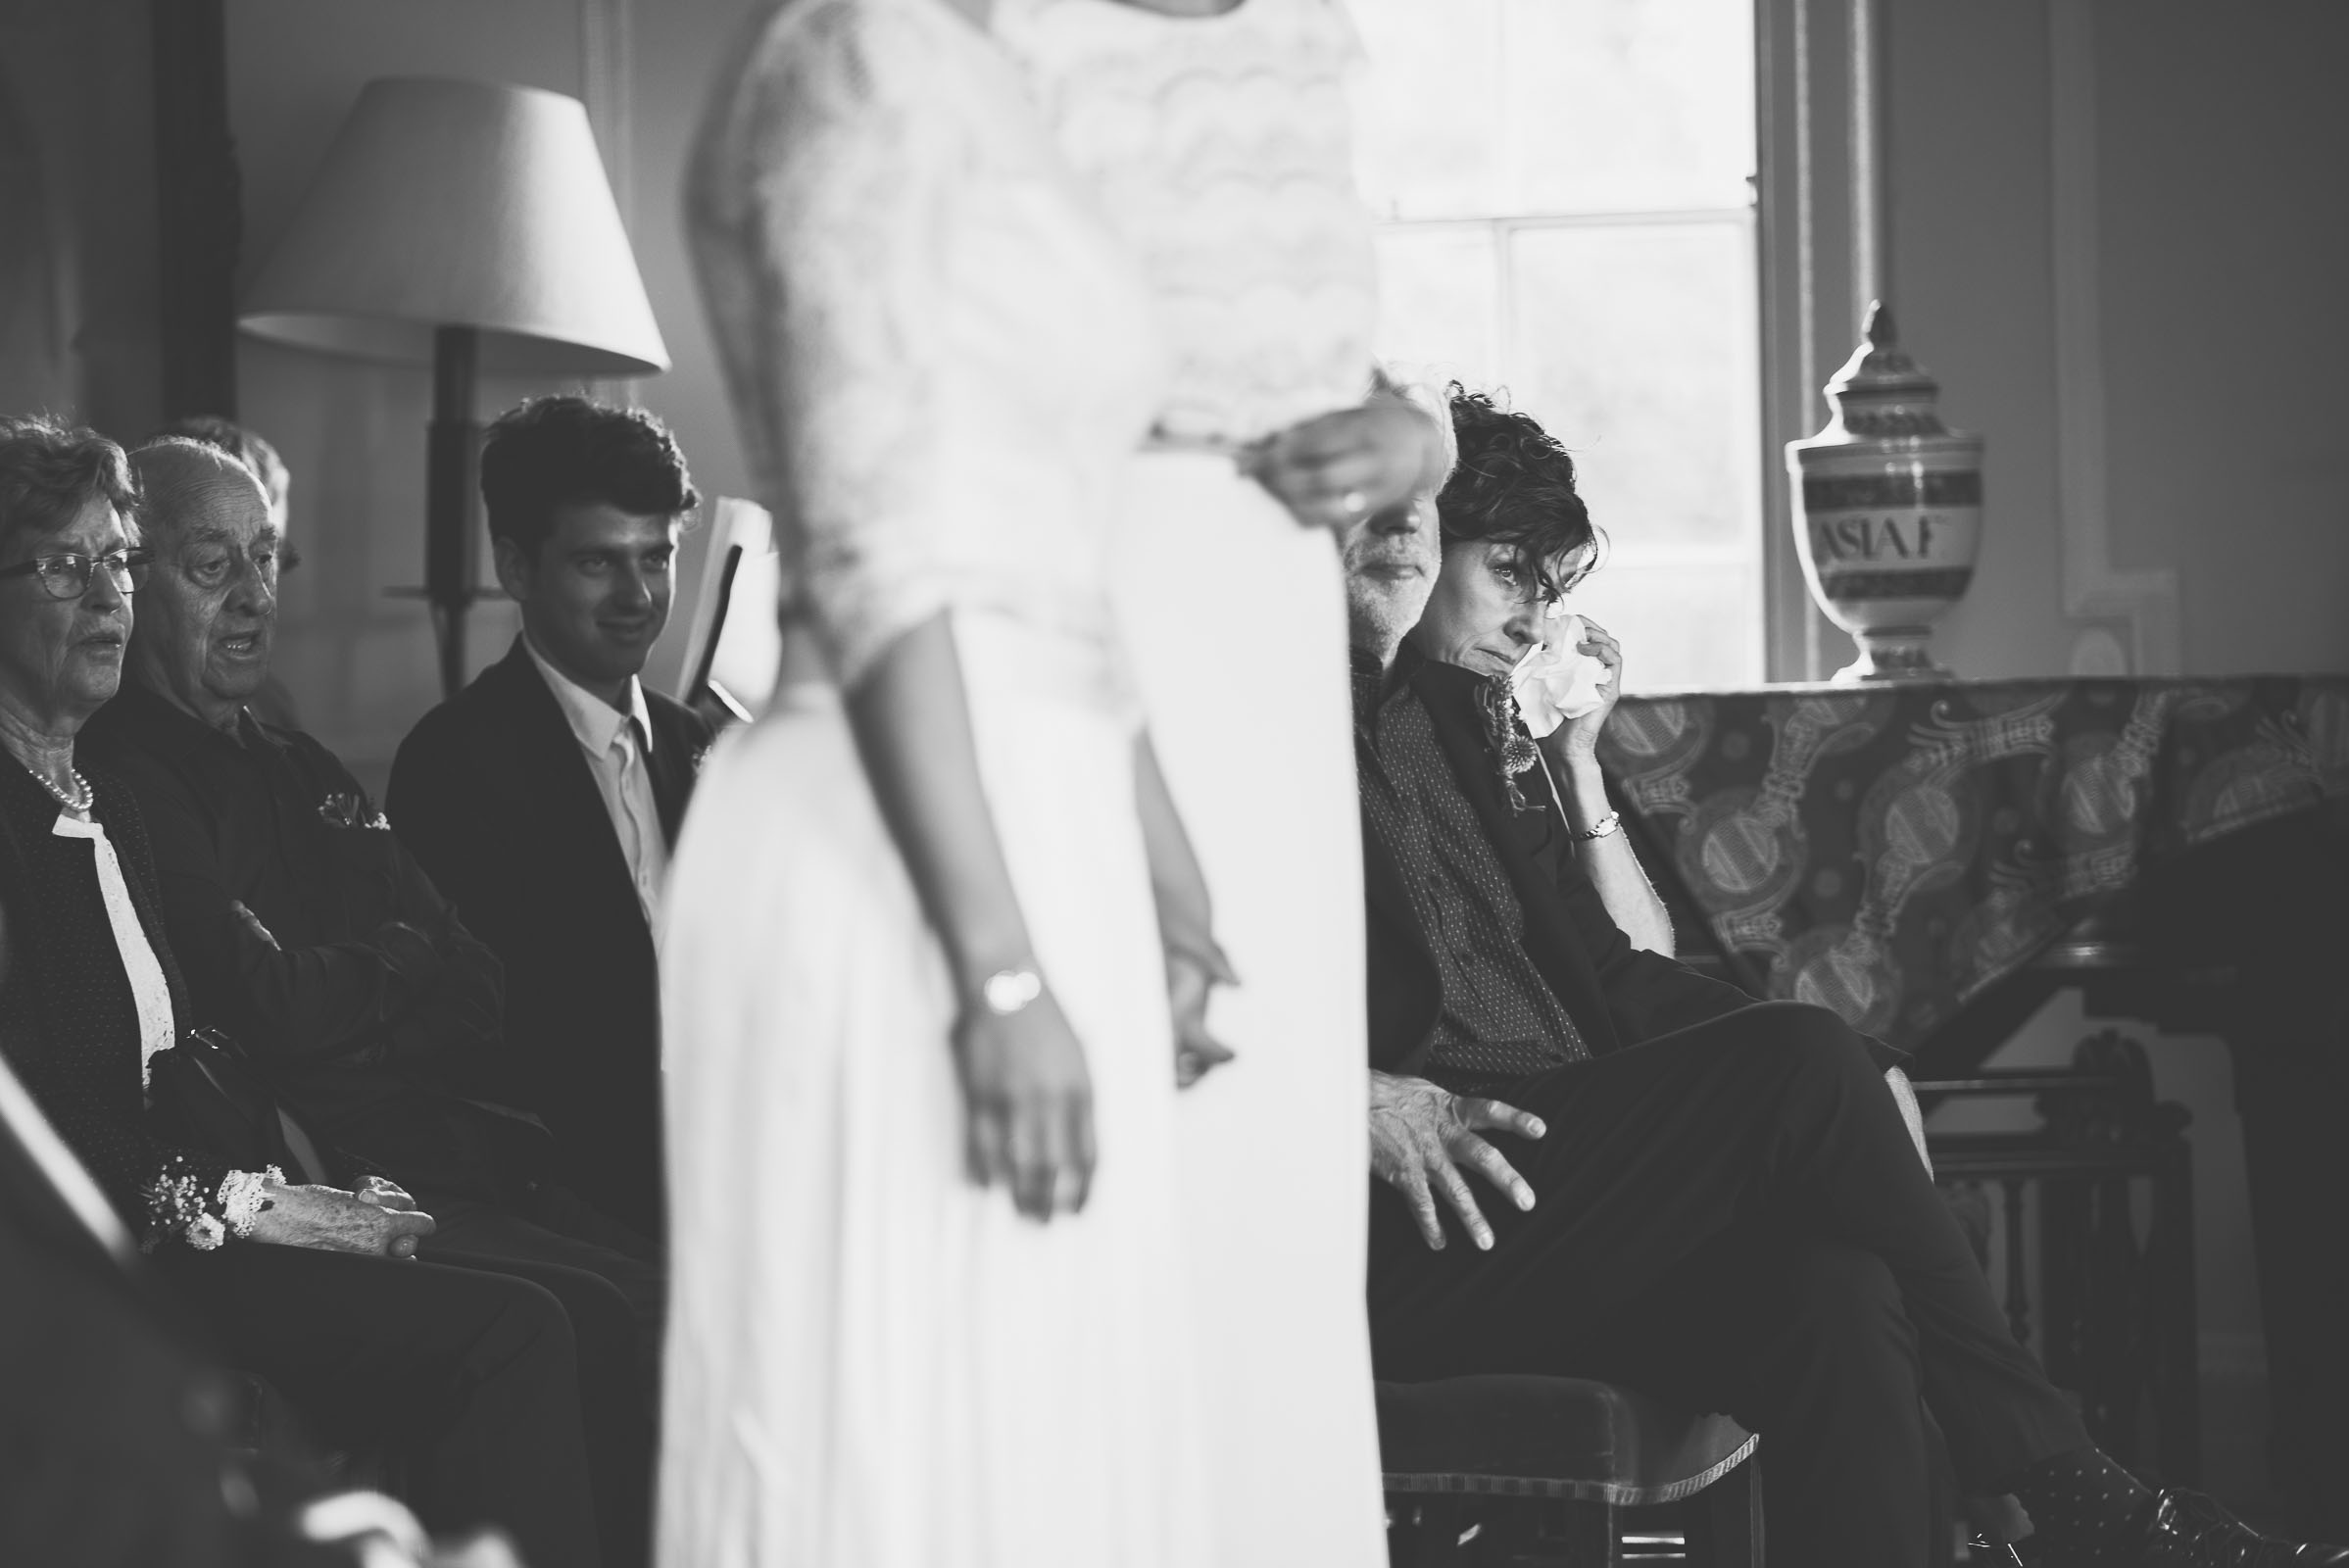 Hitchin_wedding_St_Pauls_Waldenbury_Royston_Wedding_Photographer-14.jpg